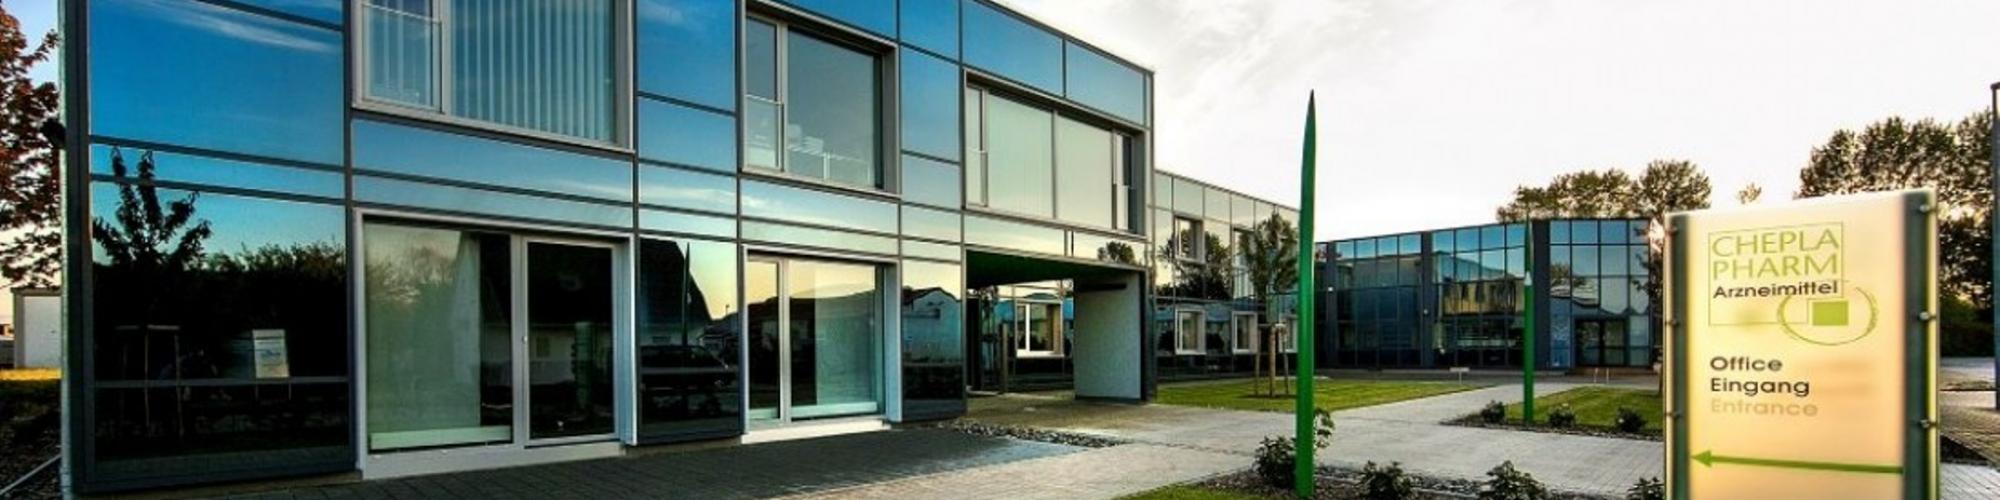 CHEPLAPHARM Arzneimittel GmbH